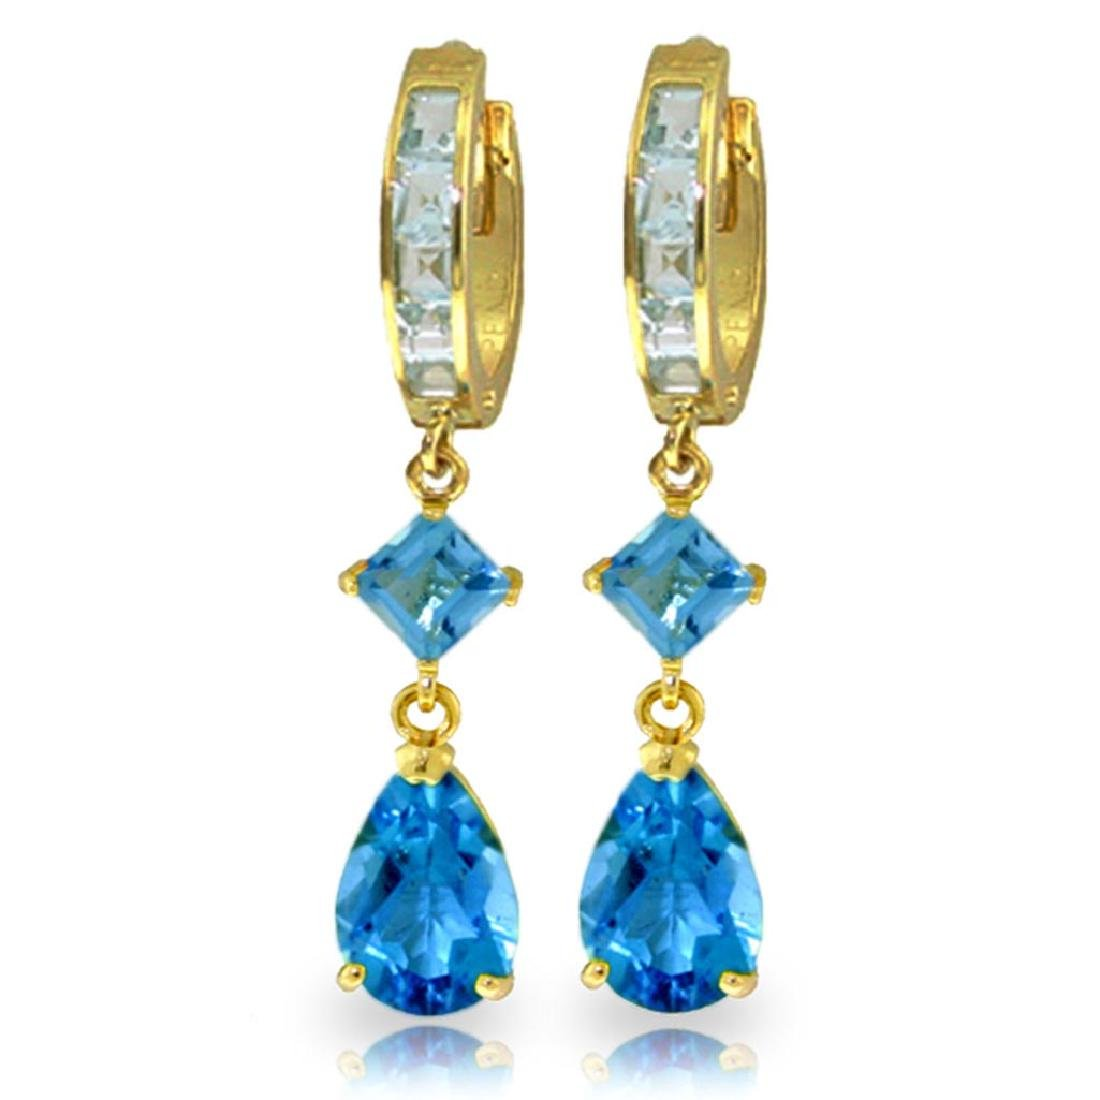 5.62 CTW 14K Solid Gold Temptation Blue Topaz Earrings